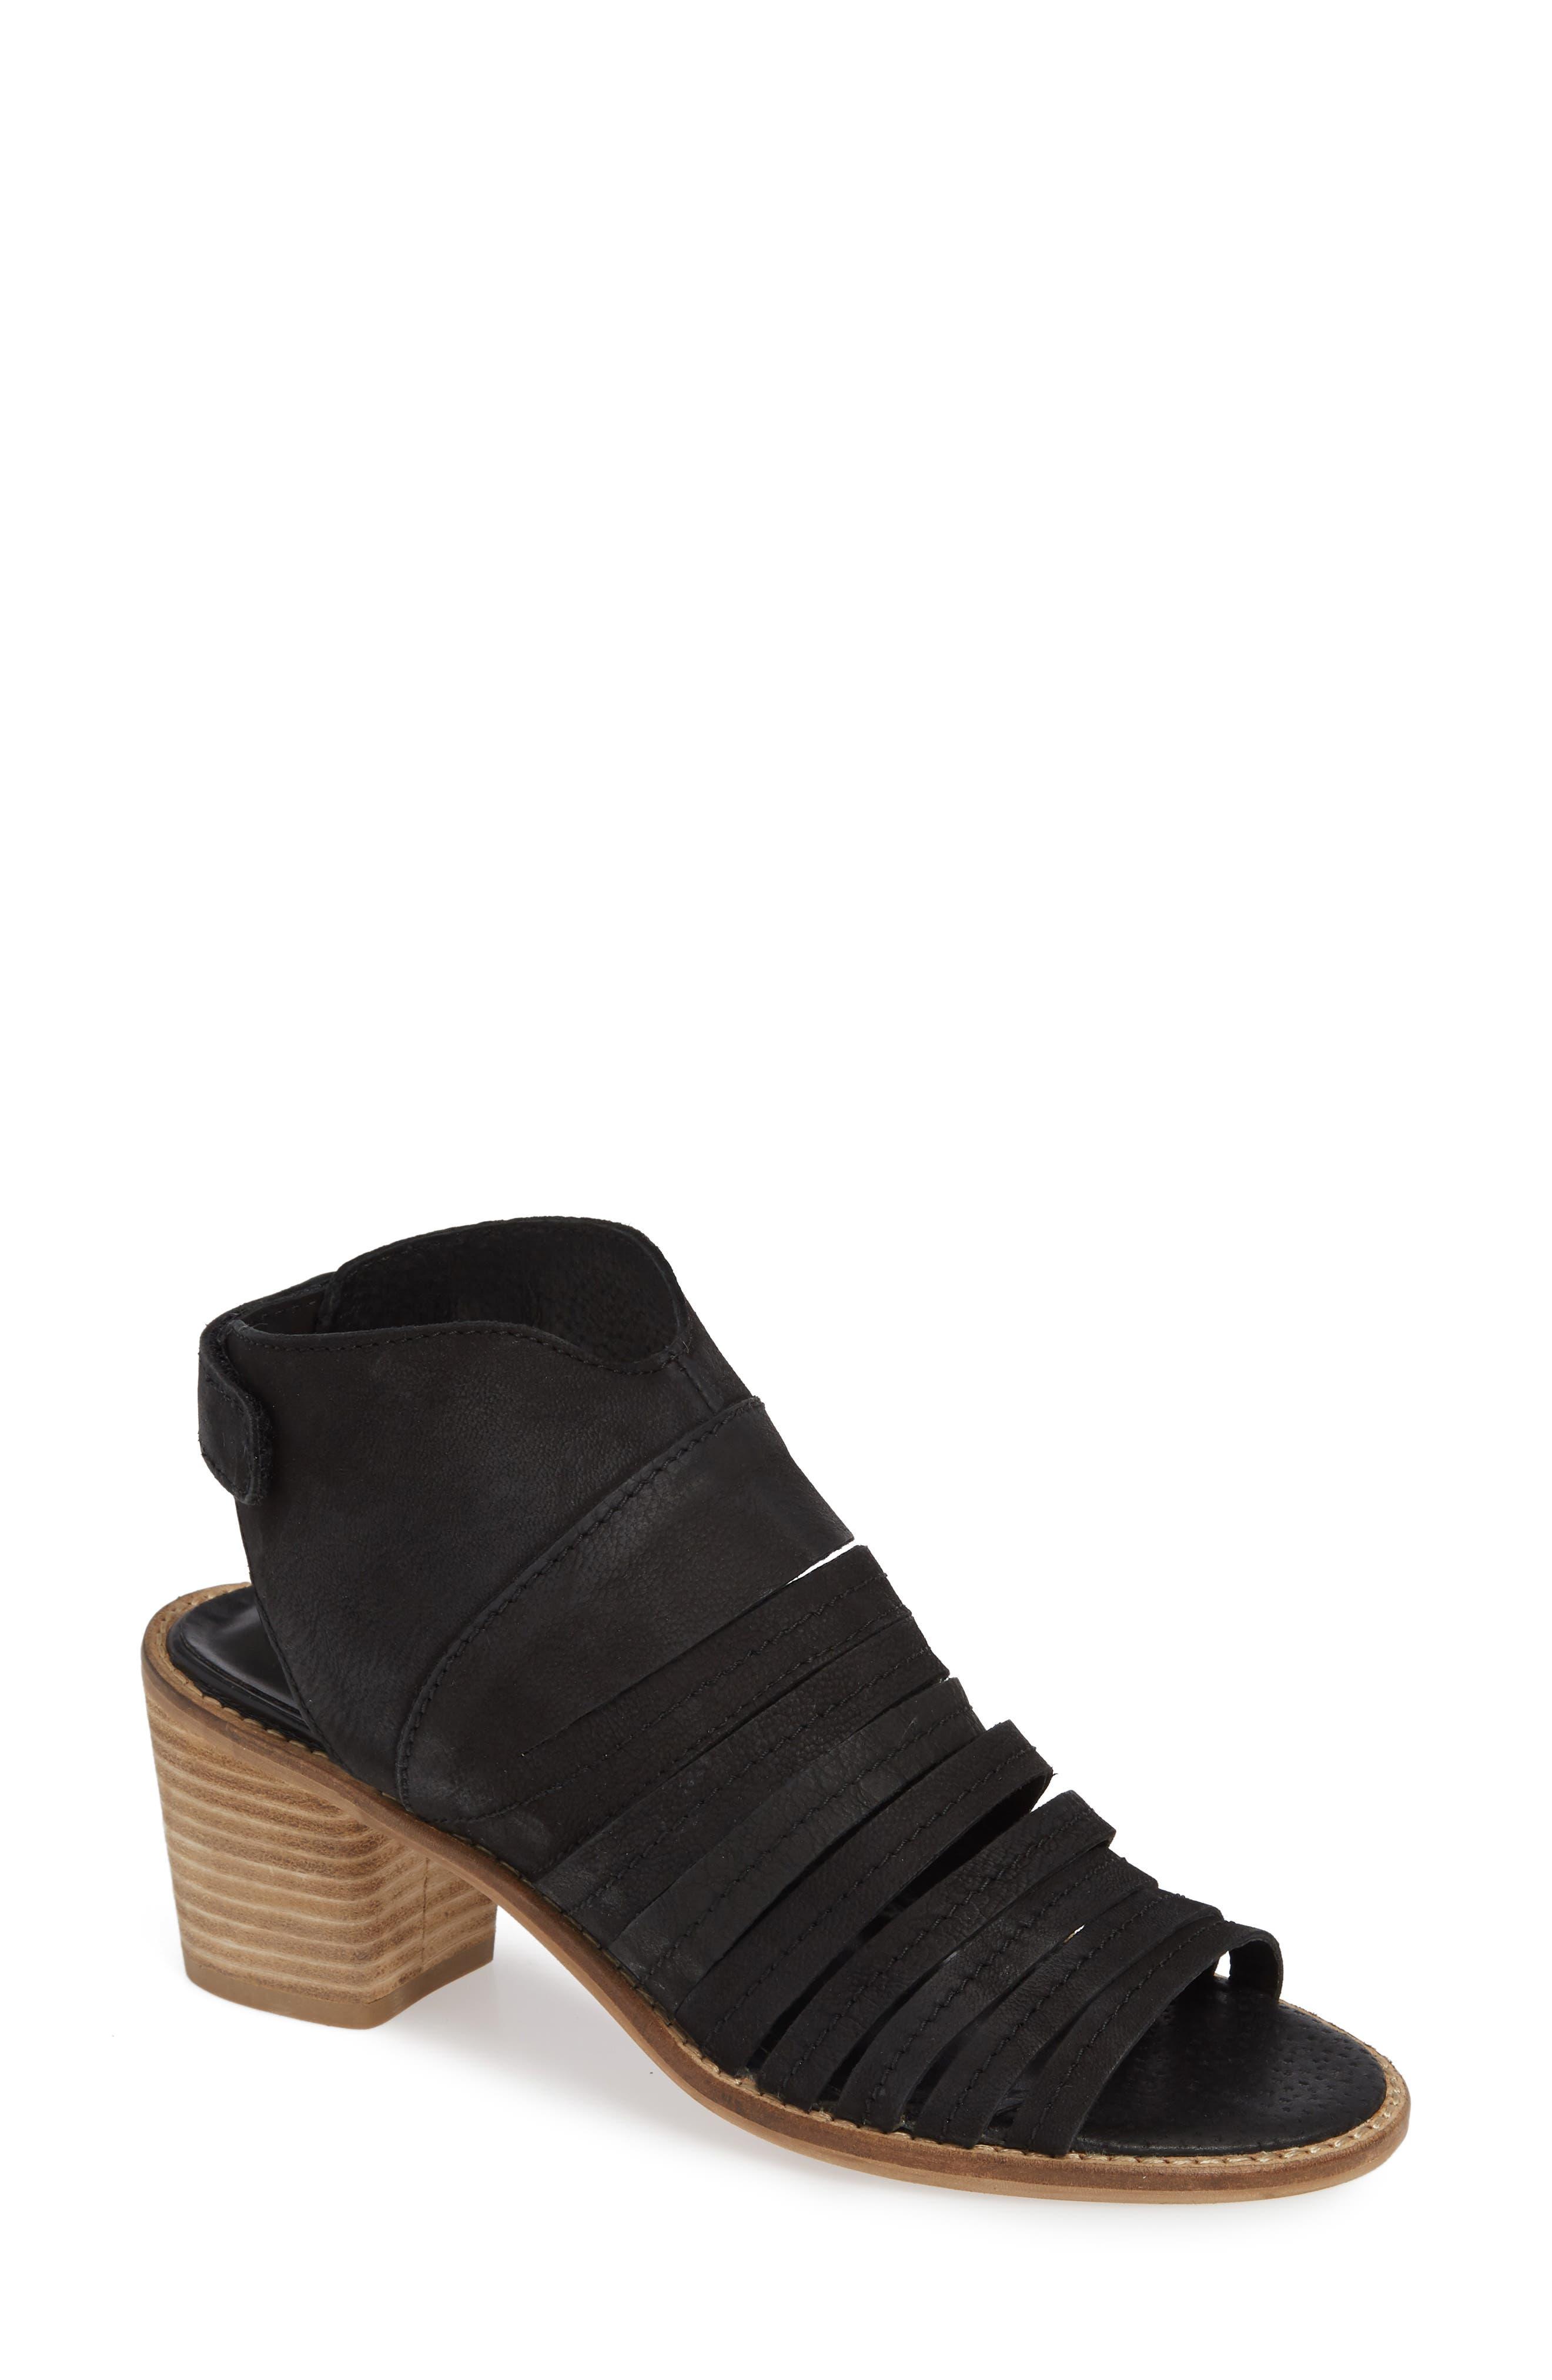 Ainsworth Sandal,                         Main,                         color, BLACK LEATHER